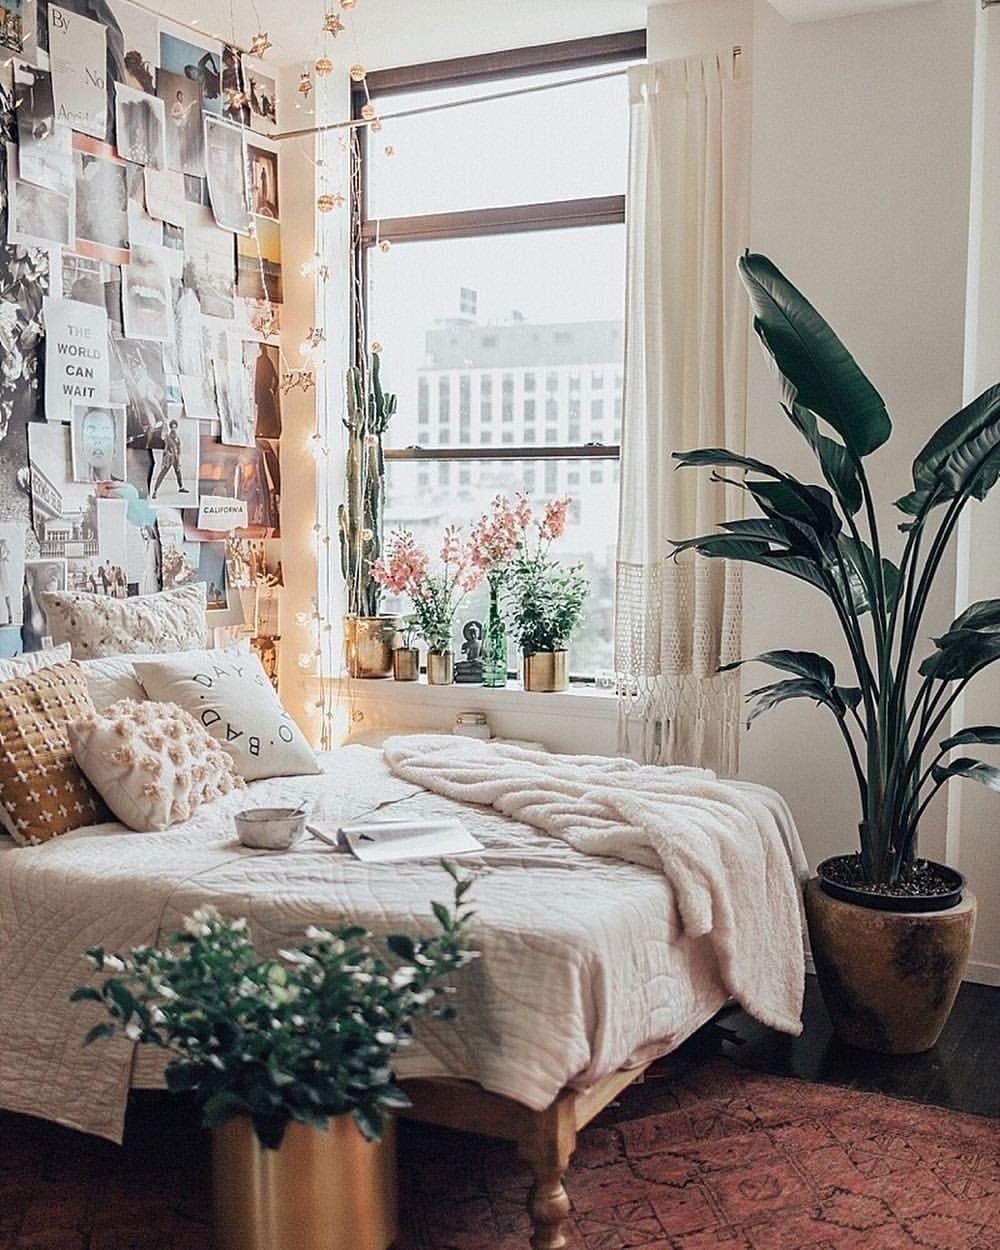 Room also pinterest xbravenewworldx instagram danae simons rh